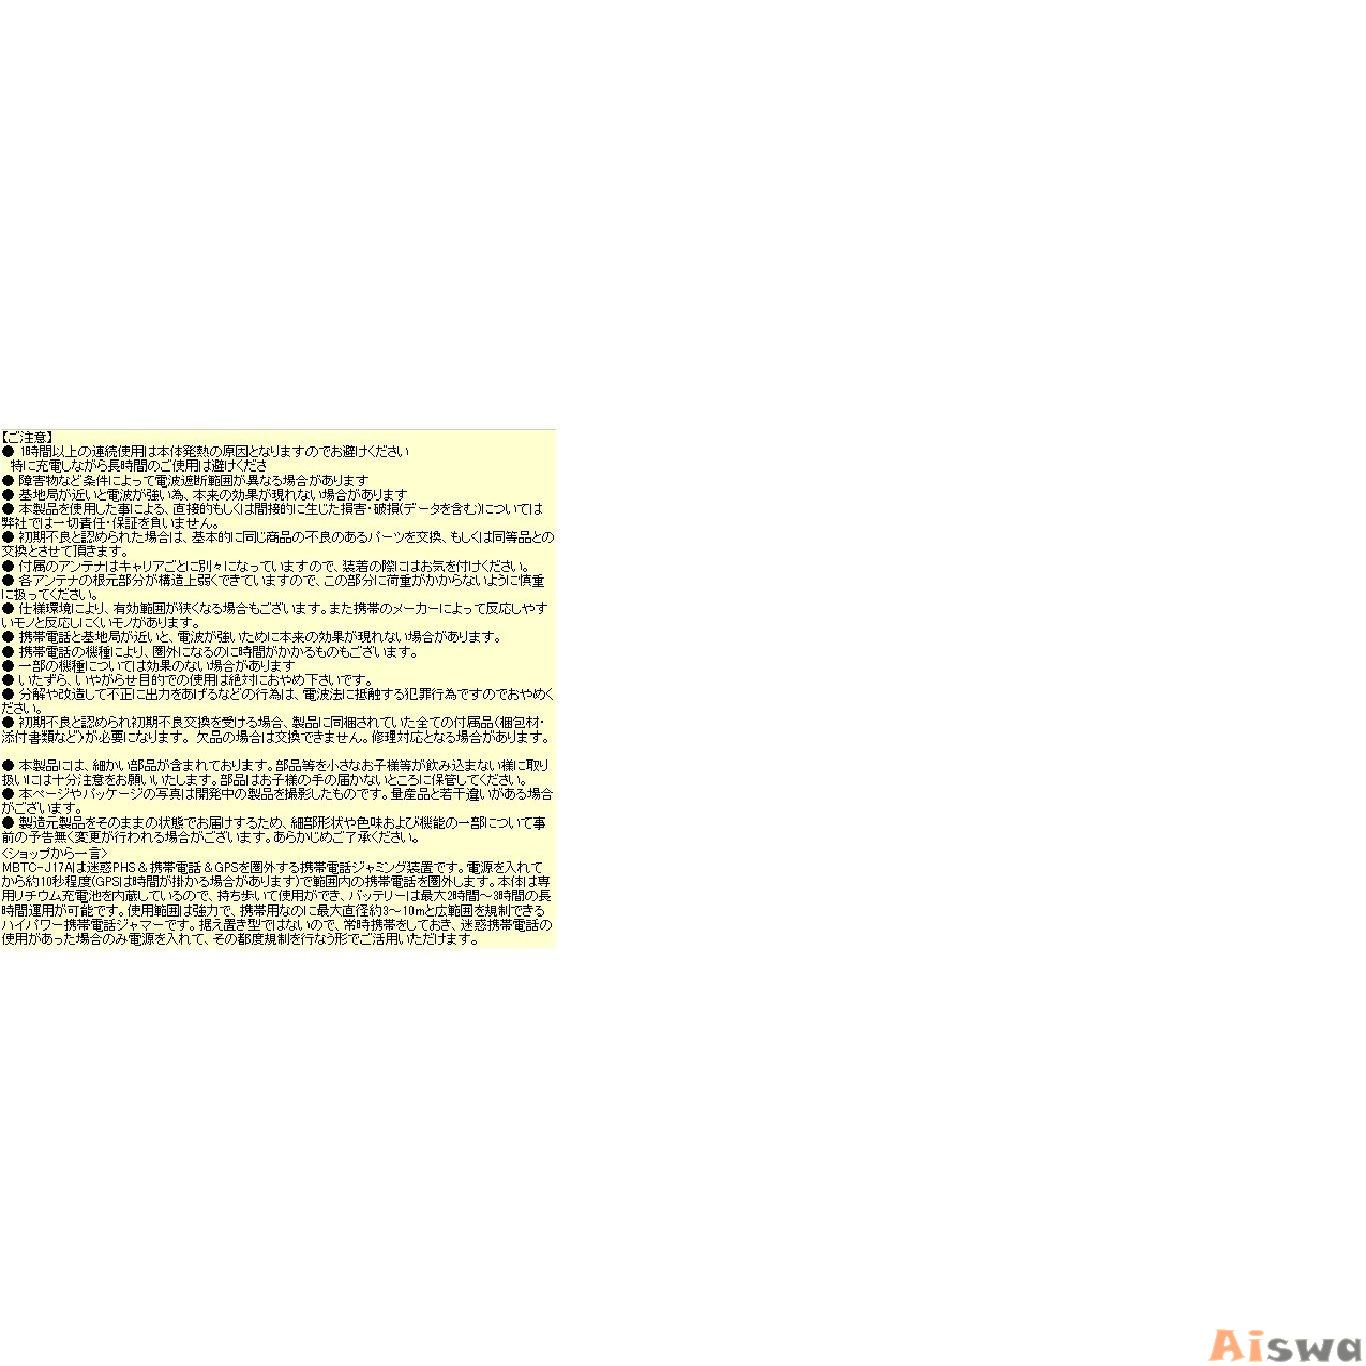 【携帯電話電波遮断機】GPS対応ハイパワー携帯電話ジャマーj17a 3jpg